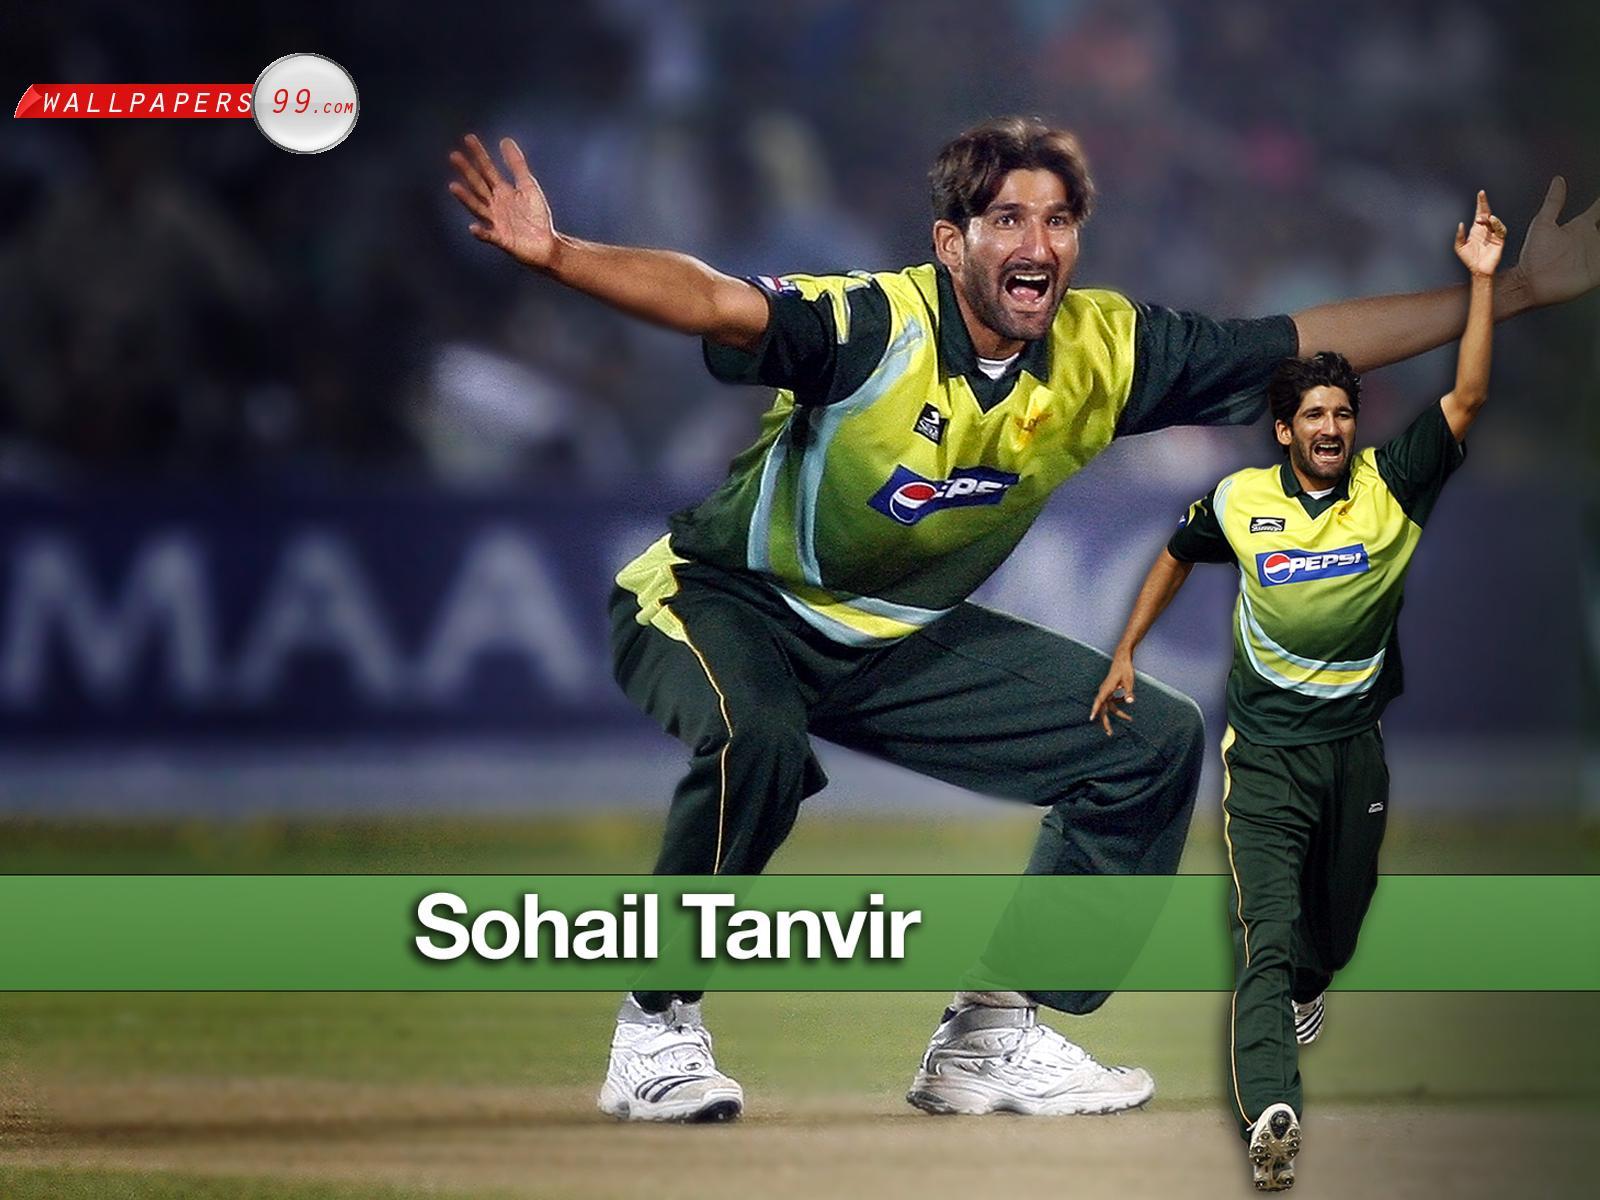 Pakistan cricket club pakistani cricket team wallpapers - Pakistan cricket wallpapers hd ...